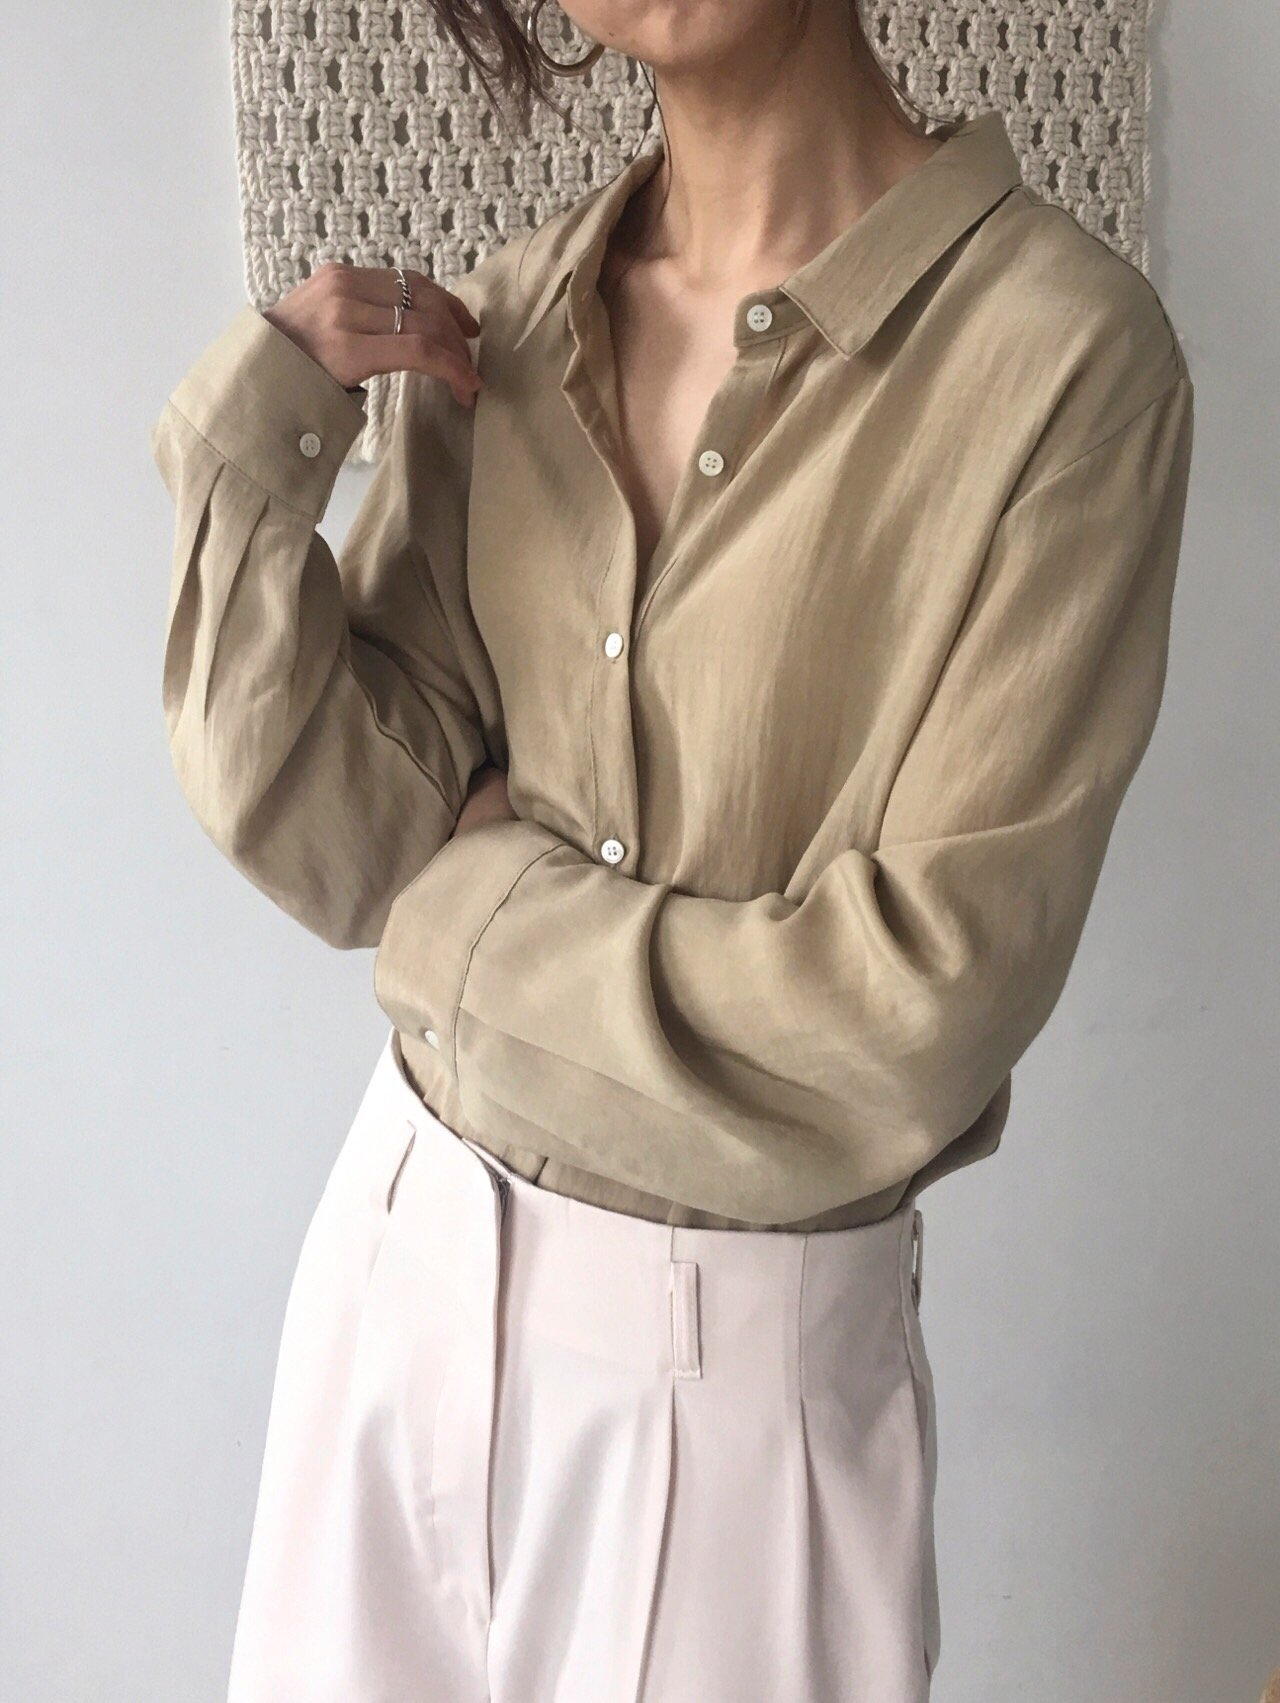 8369289dba7 루즈핏셔츠 여자루즈핏셔츠 여자셔츠 여성셔츠 여자남방 여성남방 핑크셔츠 베이지셔츠 여자봄셔츠 여성봄셔츠